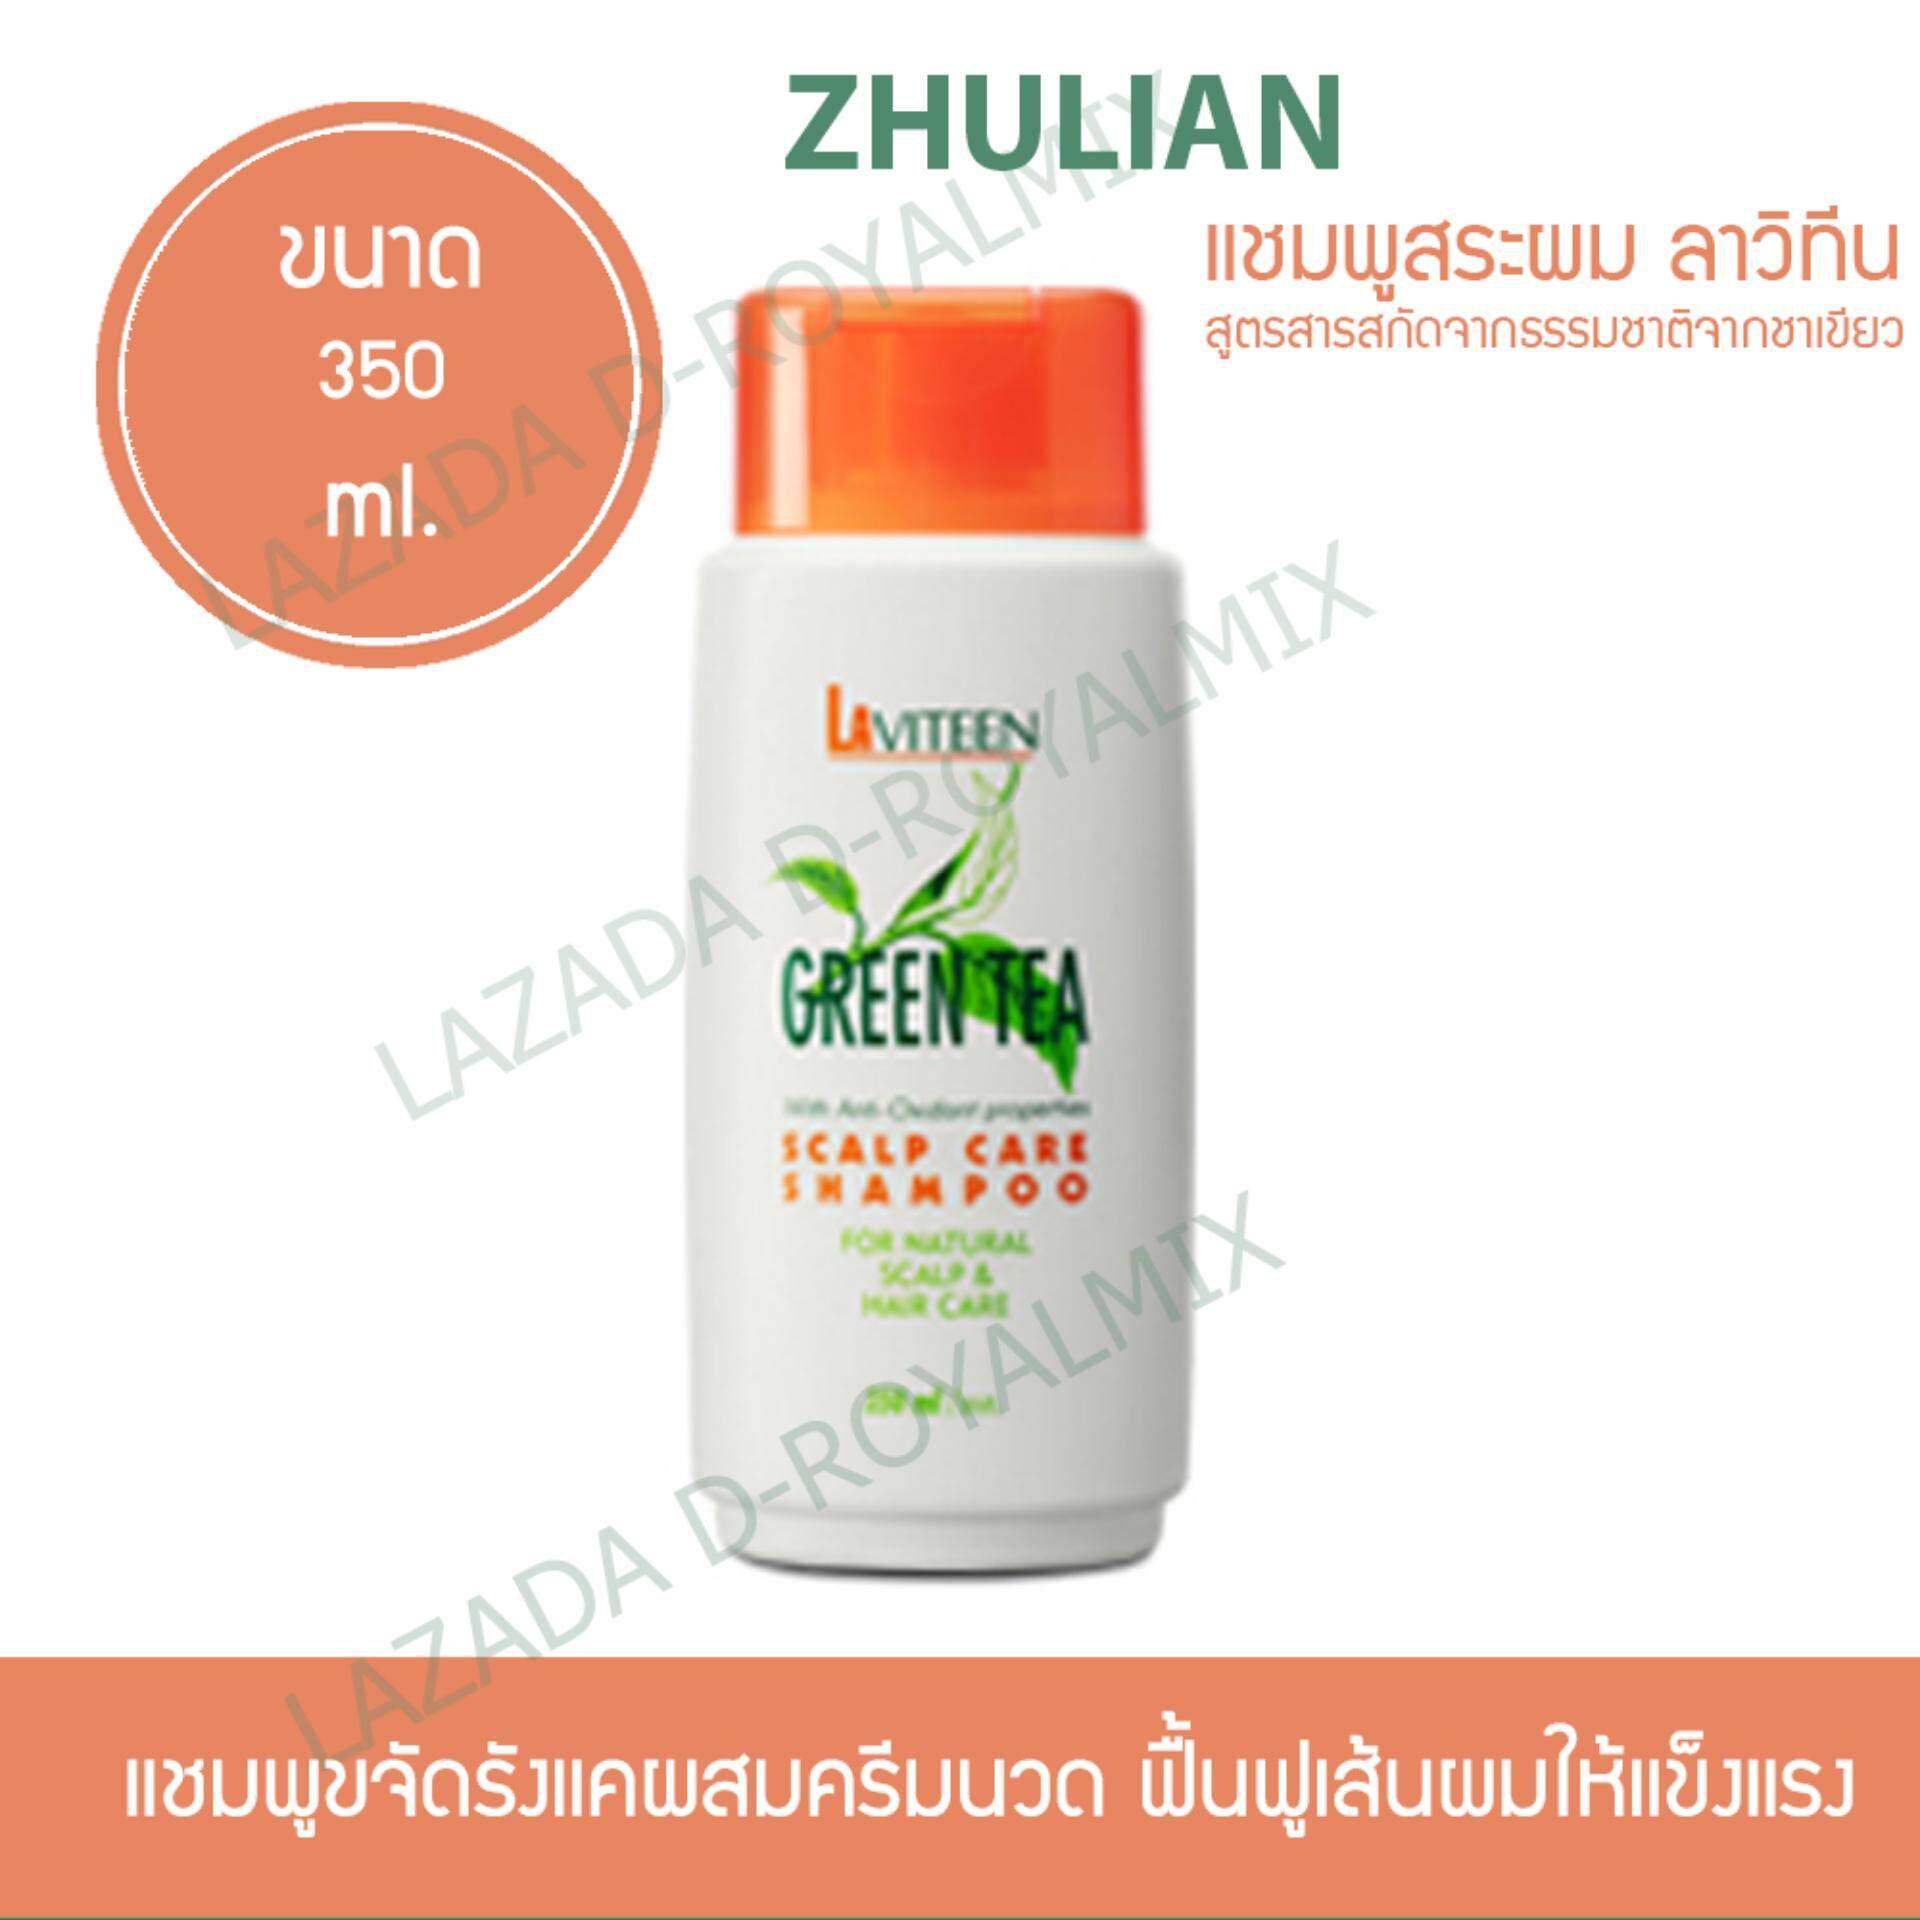 zhulian แชมพูขจัดรังแค ลาวีทีน Scalp Care Shampoo for Natural Scalp & Hair Care ของแท้100%